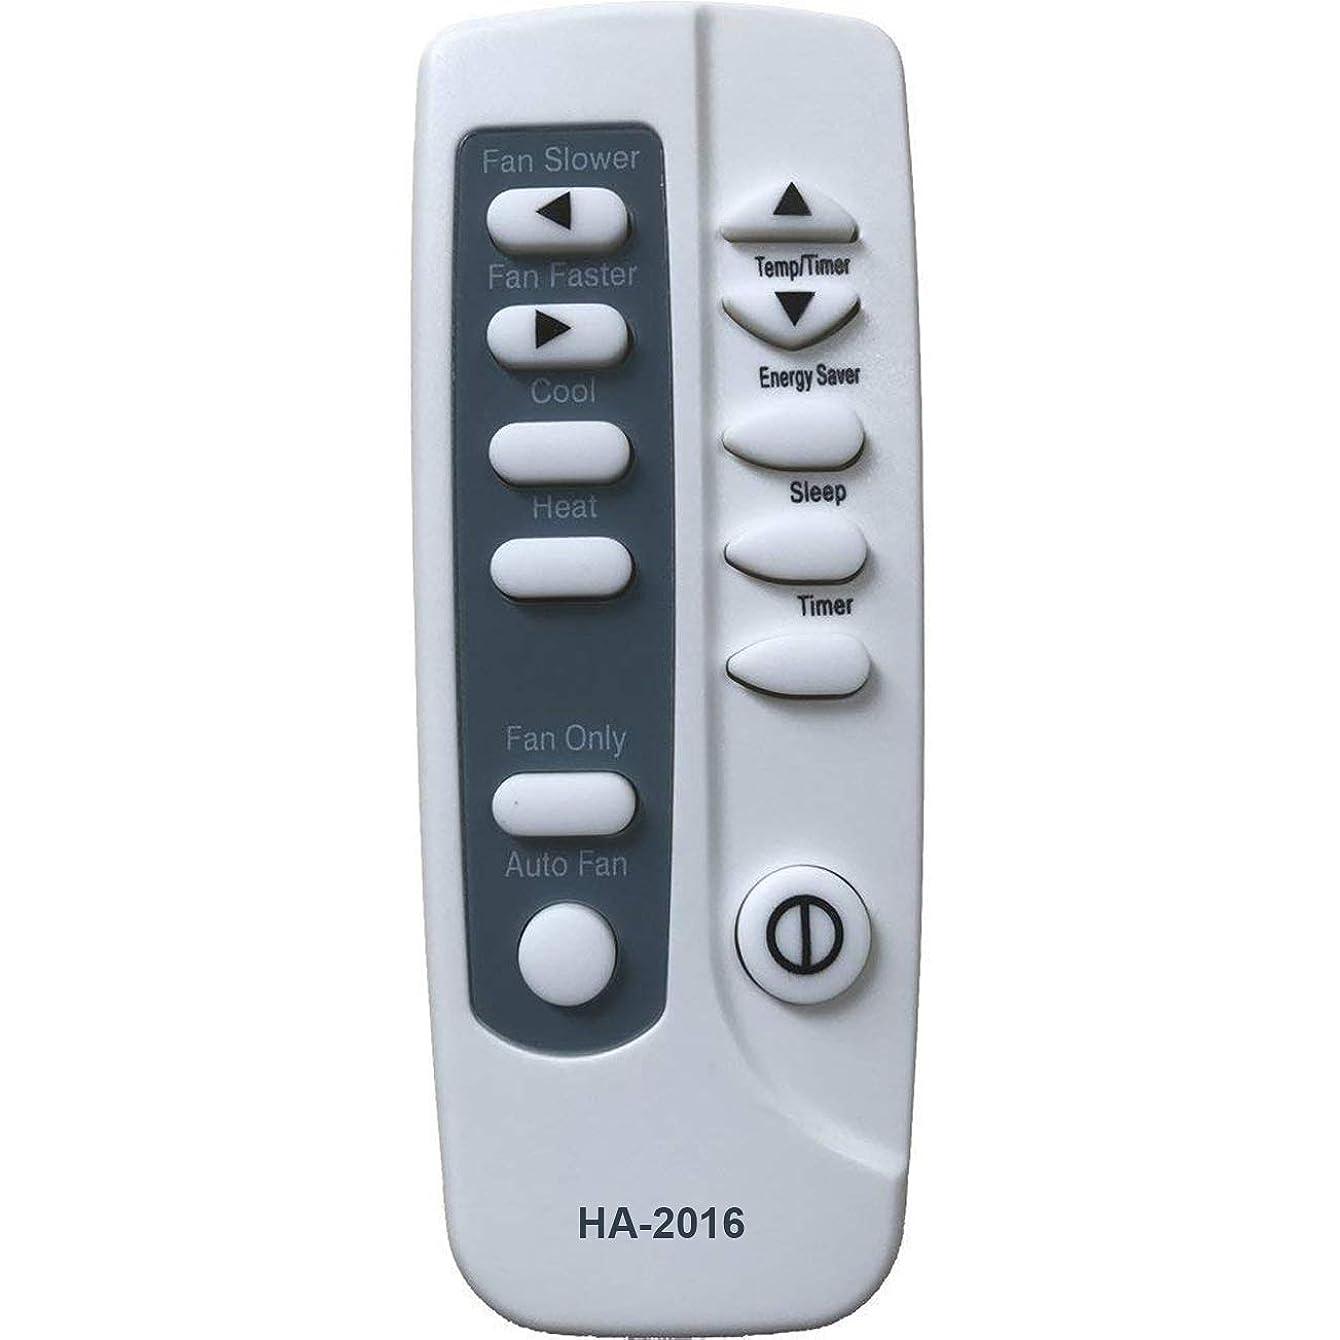 HA-2016 Replaces Frigidaire Air Conditioner Remote Control YN1G 5304459106 Works for FAH086R1T1 FAH106R1T1 FAH106R2T1 FAH10ER2T1 FAH126R2T1 FAH12ER2T1